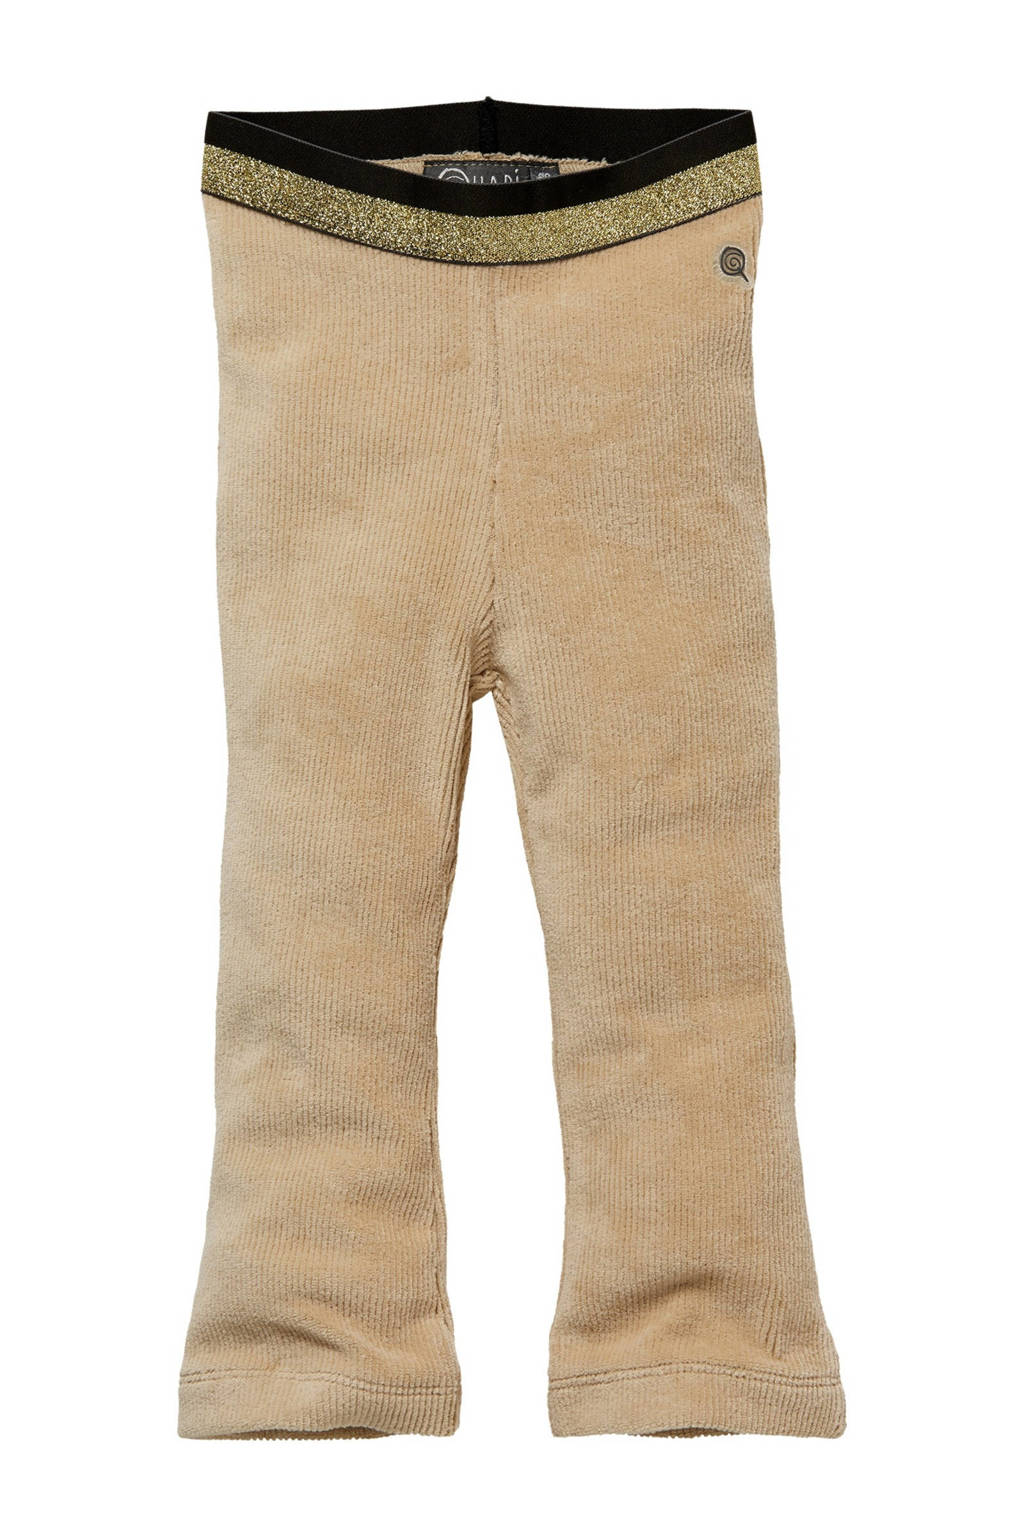 Quapi Mini corduroy regular fit broek Lisa zand, Zand